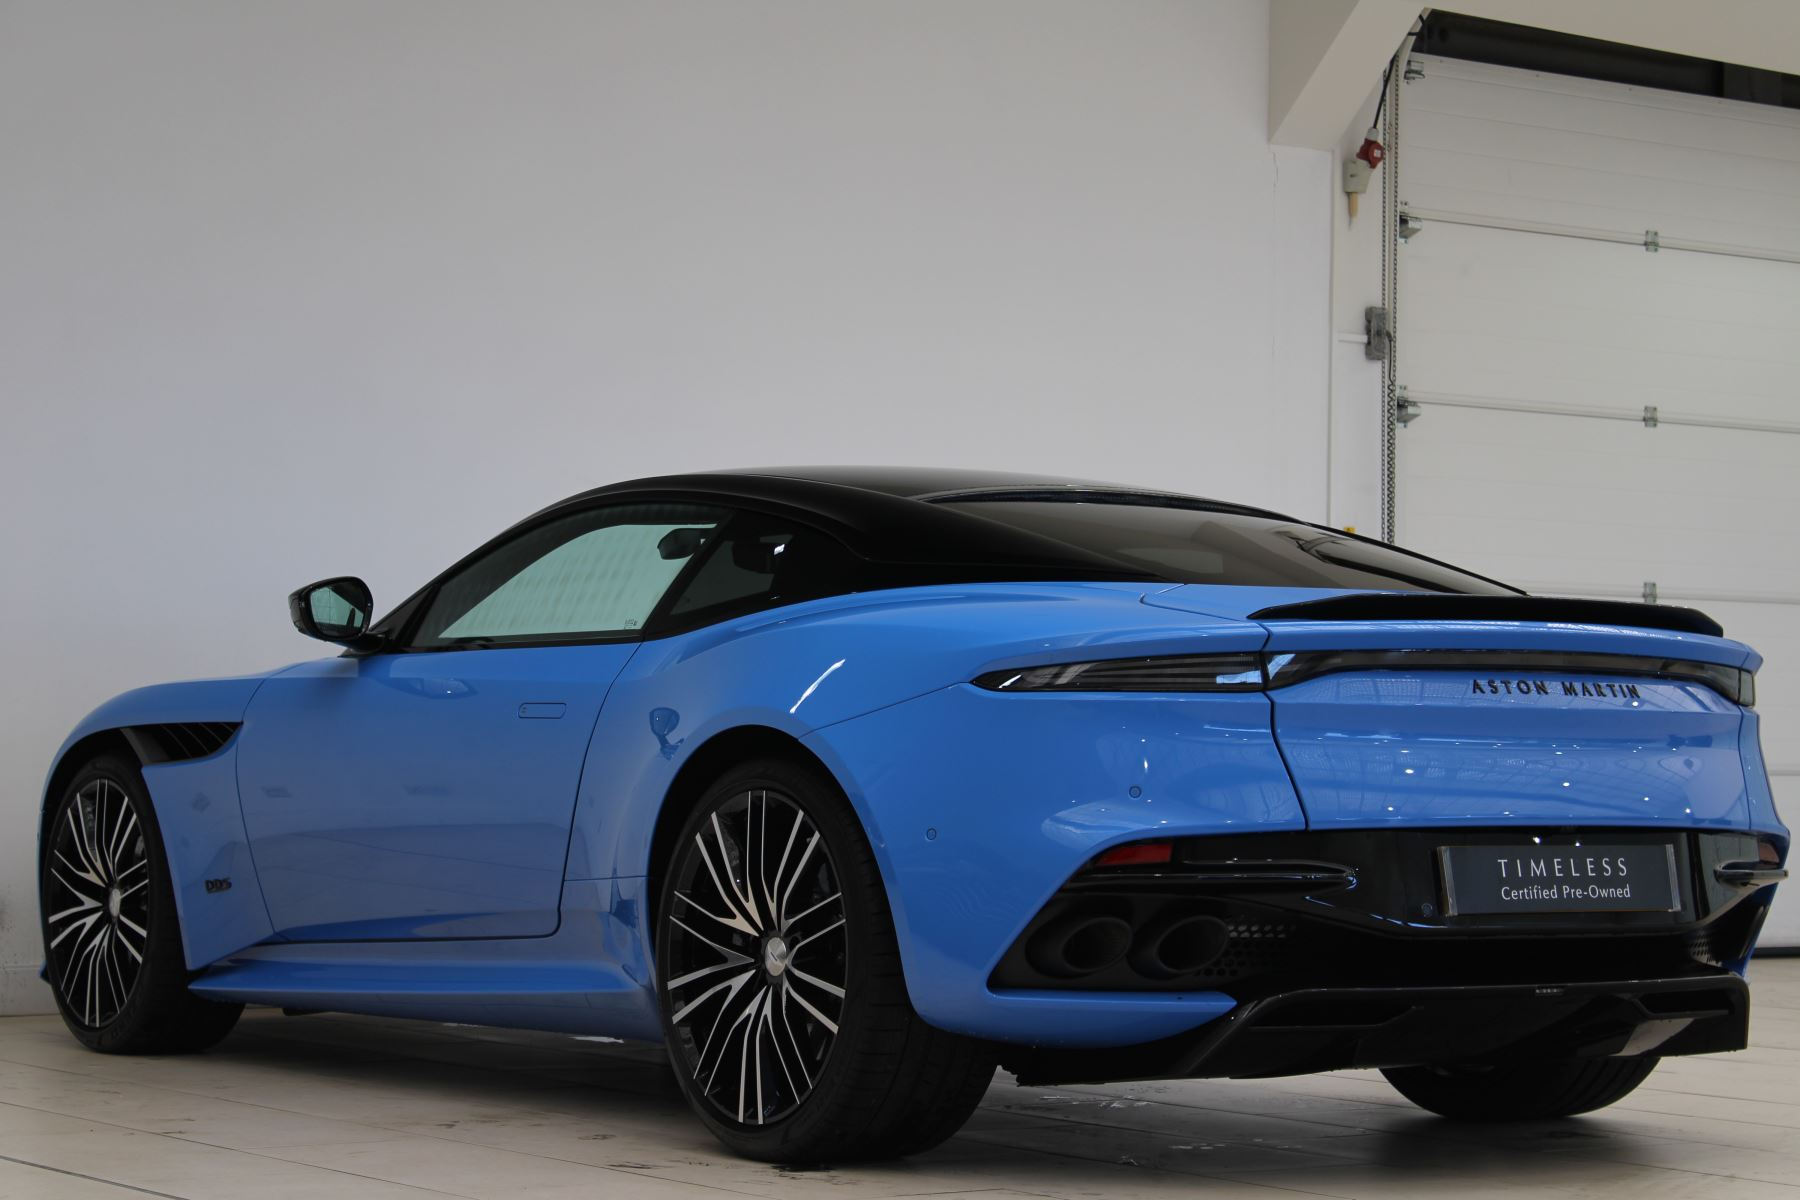 Aston Martin DBS V12 Superleggera Touchtronic Special Ceramic Blue - B&O image 9